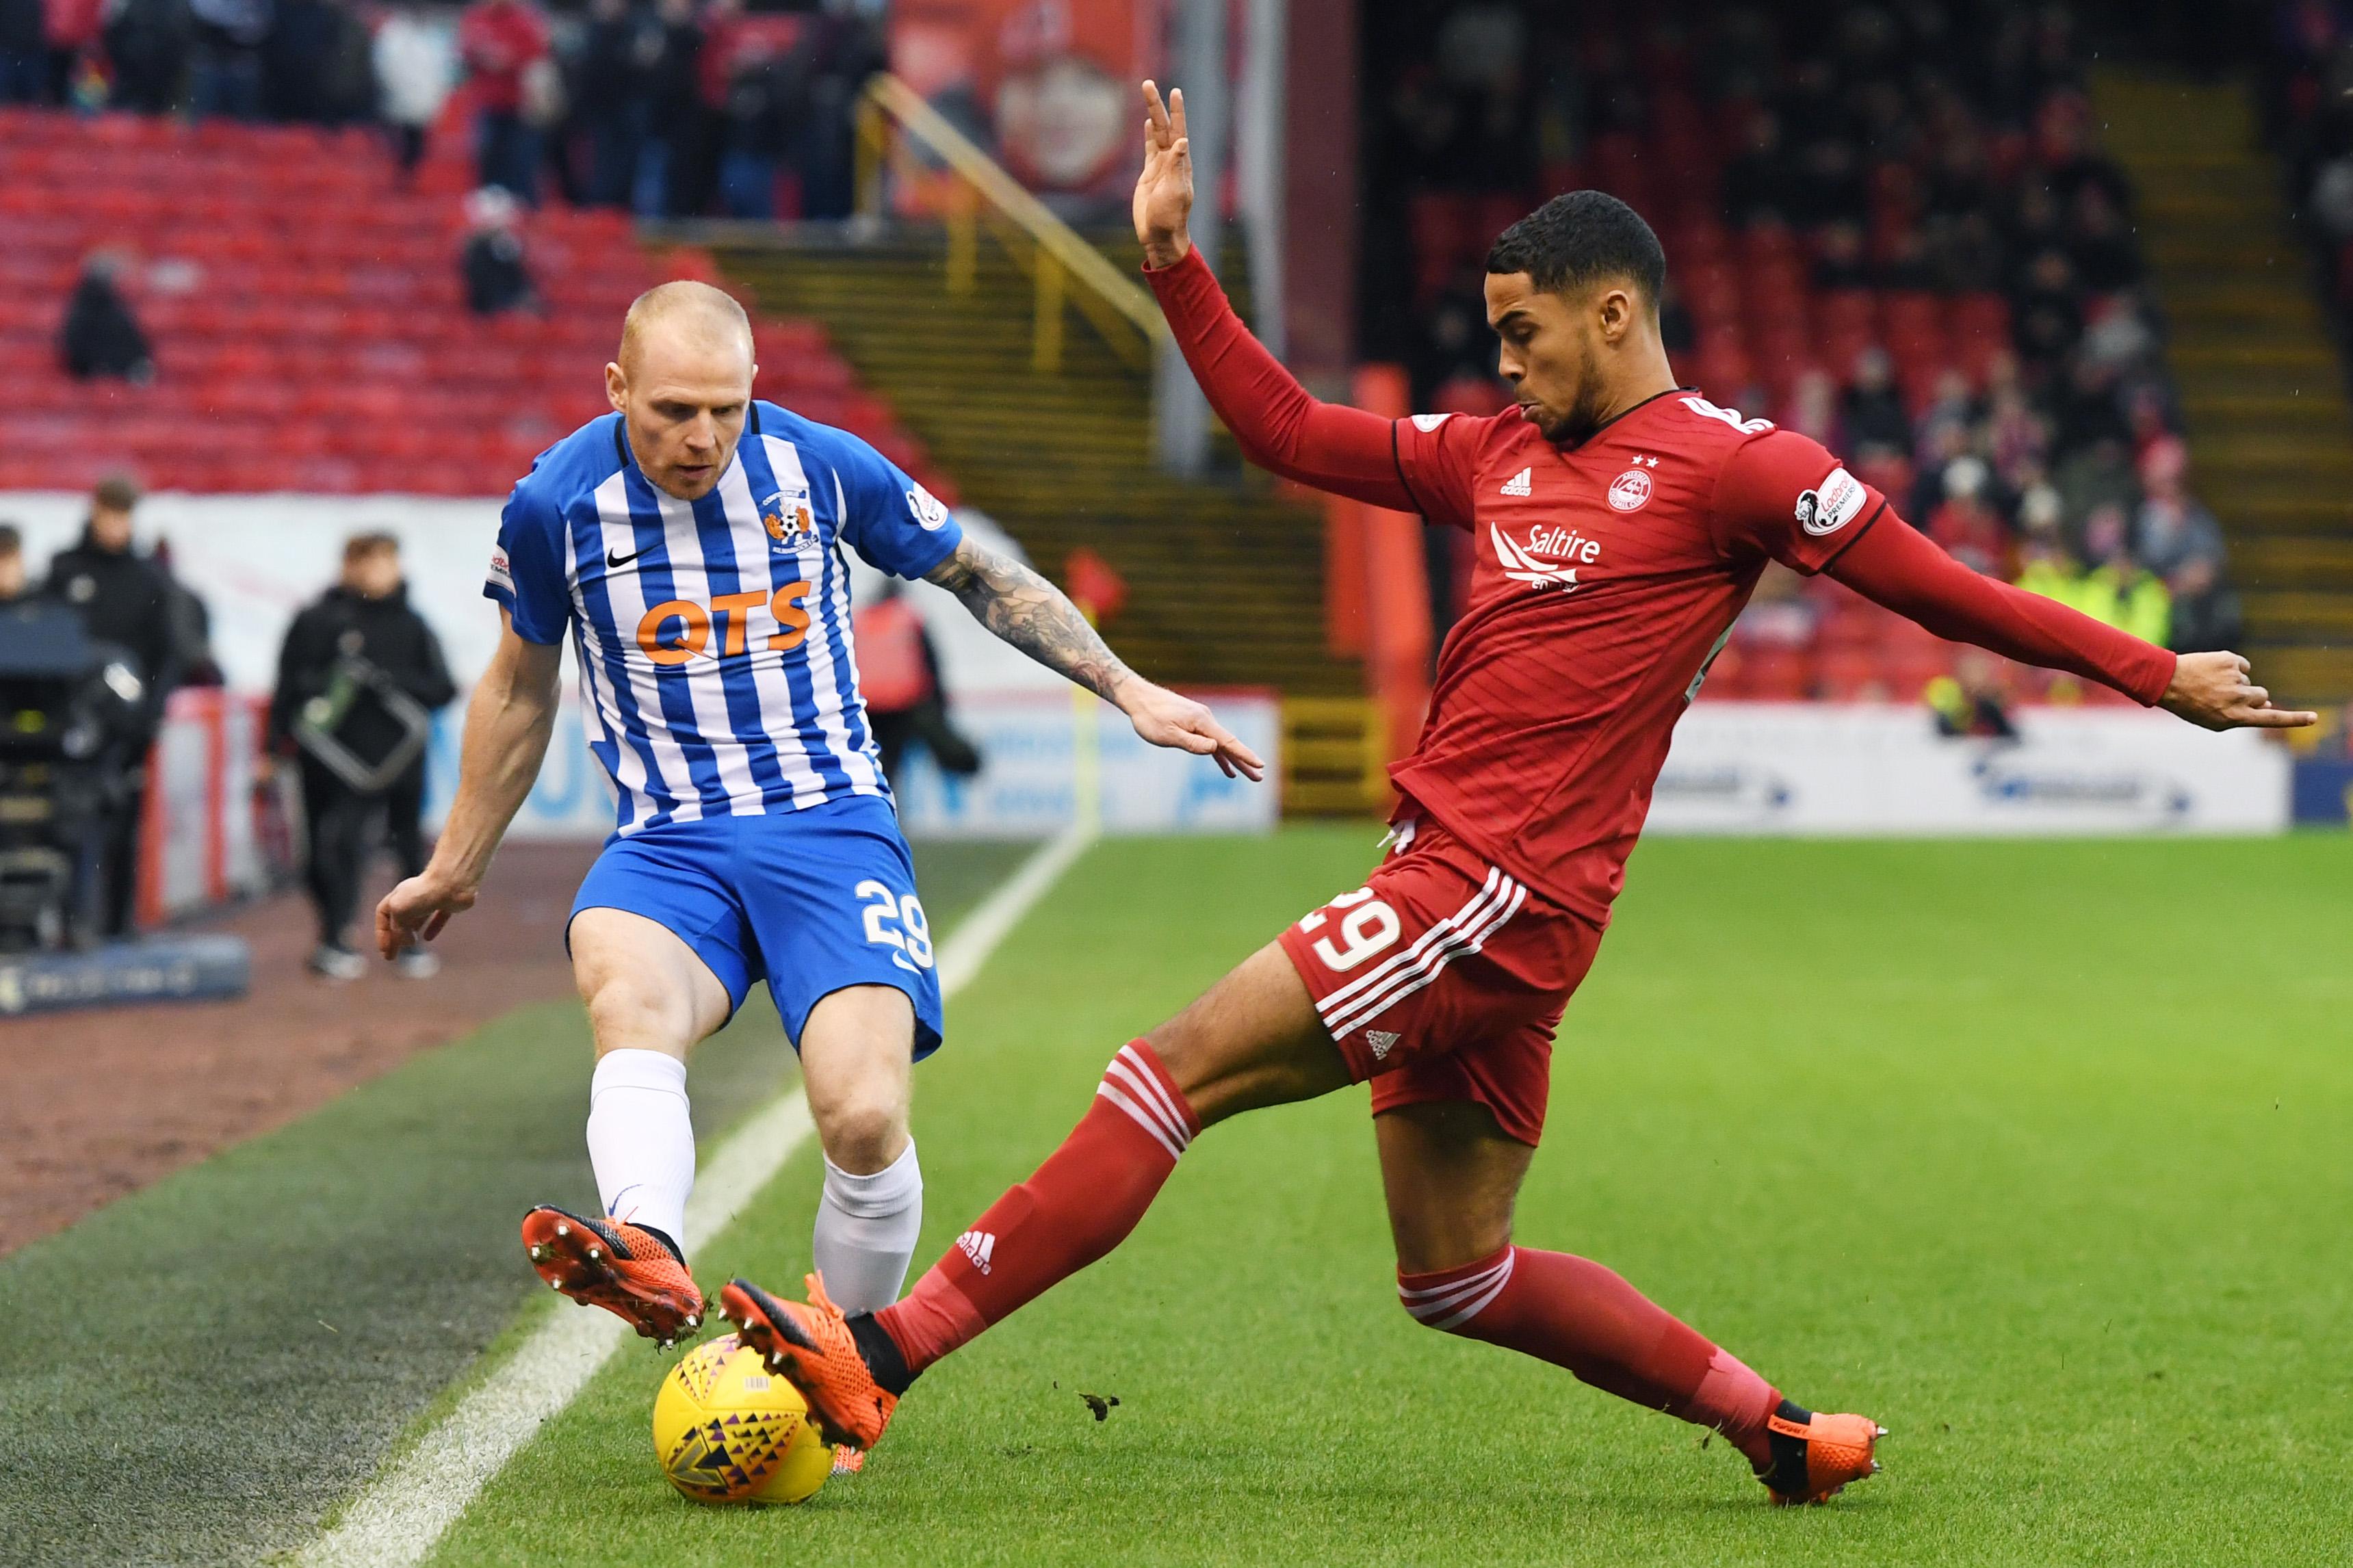 Aberdeen's Max Lowe challenges Chris Burke